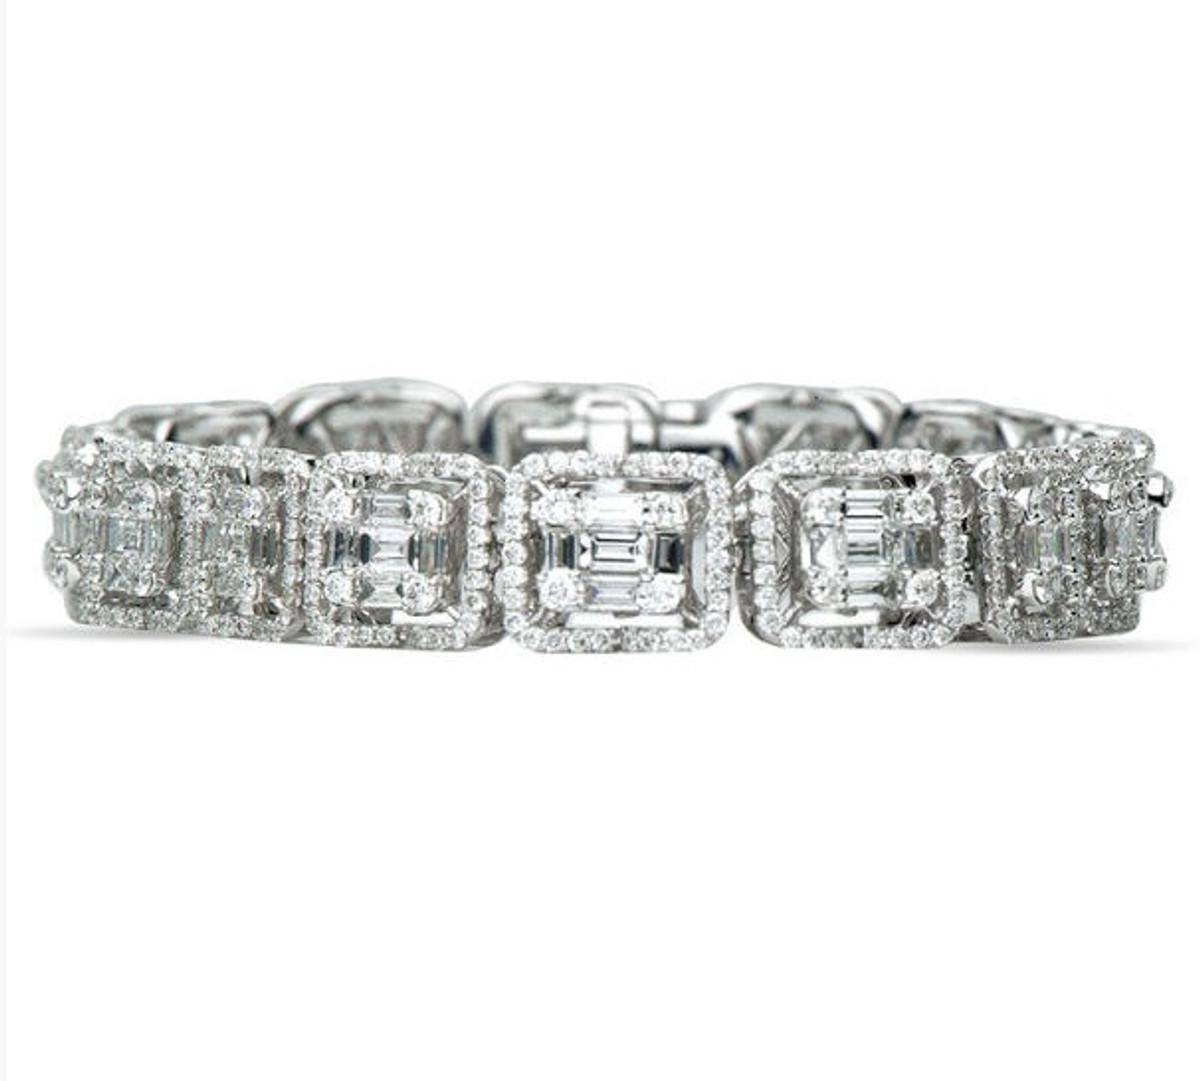 7.05 Ct Tw Round & Baguette Diamond Bracelet